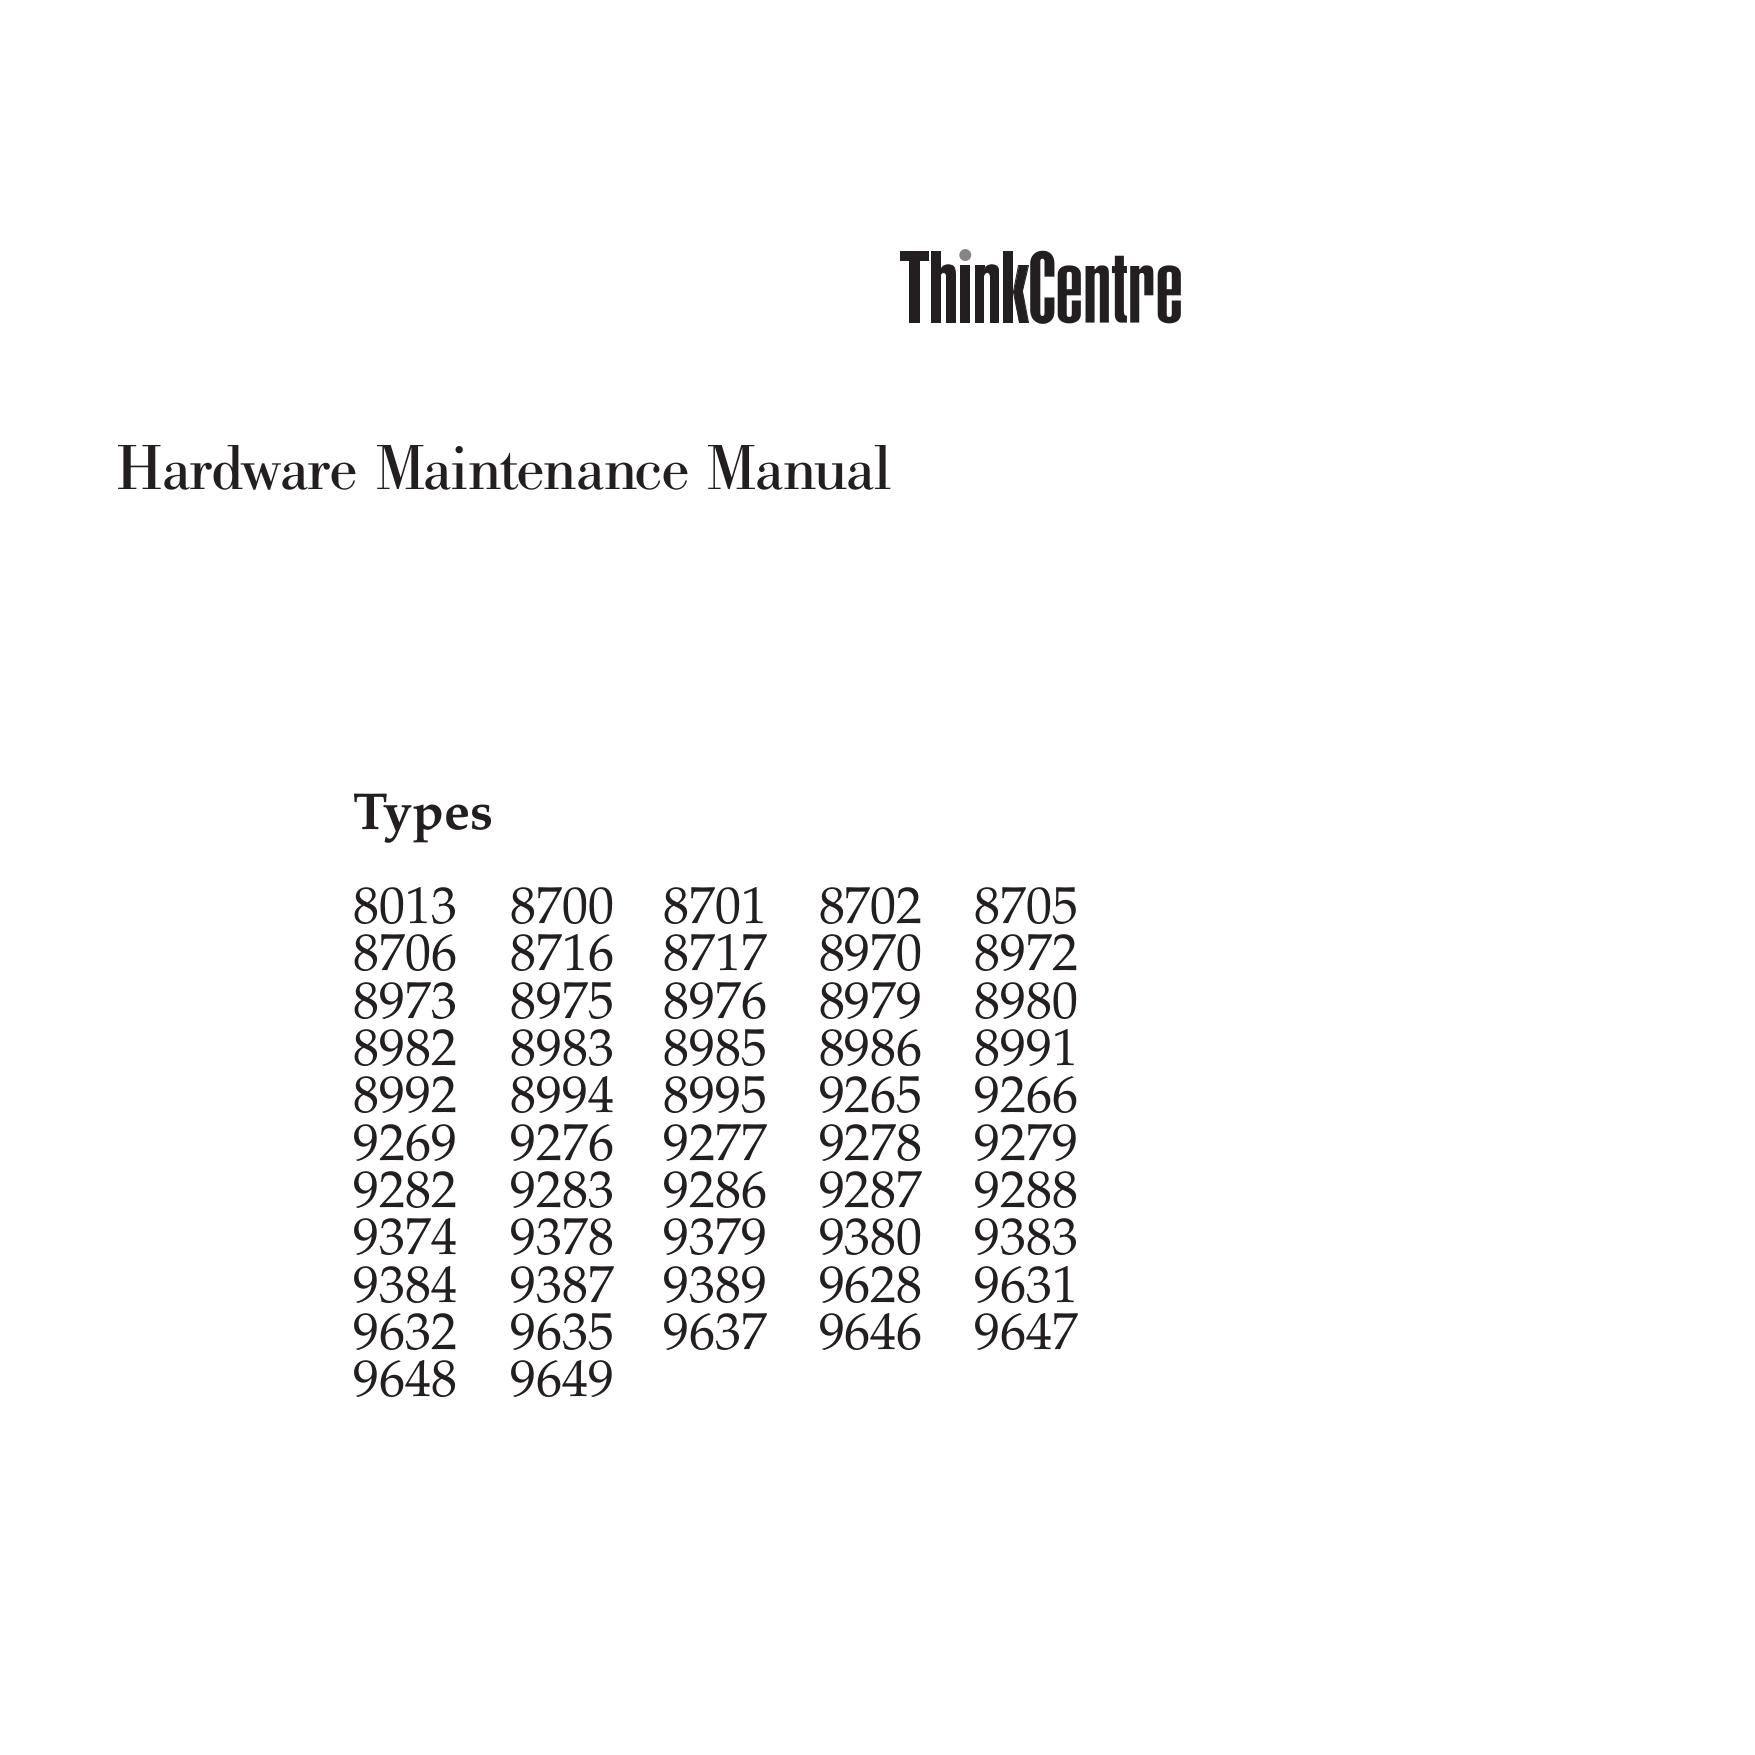 pdf for Lenovo Desktop ThinkCentre M55e 9637 manual